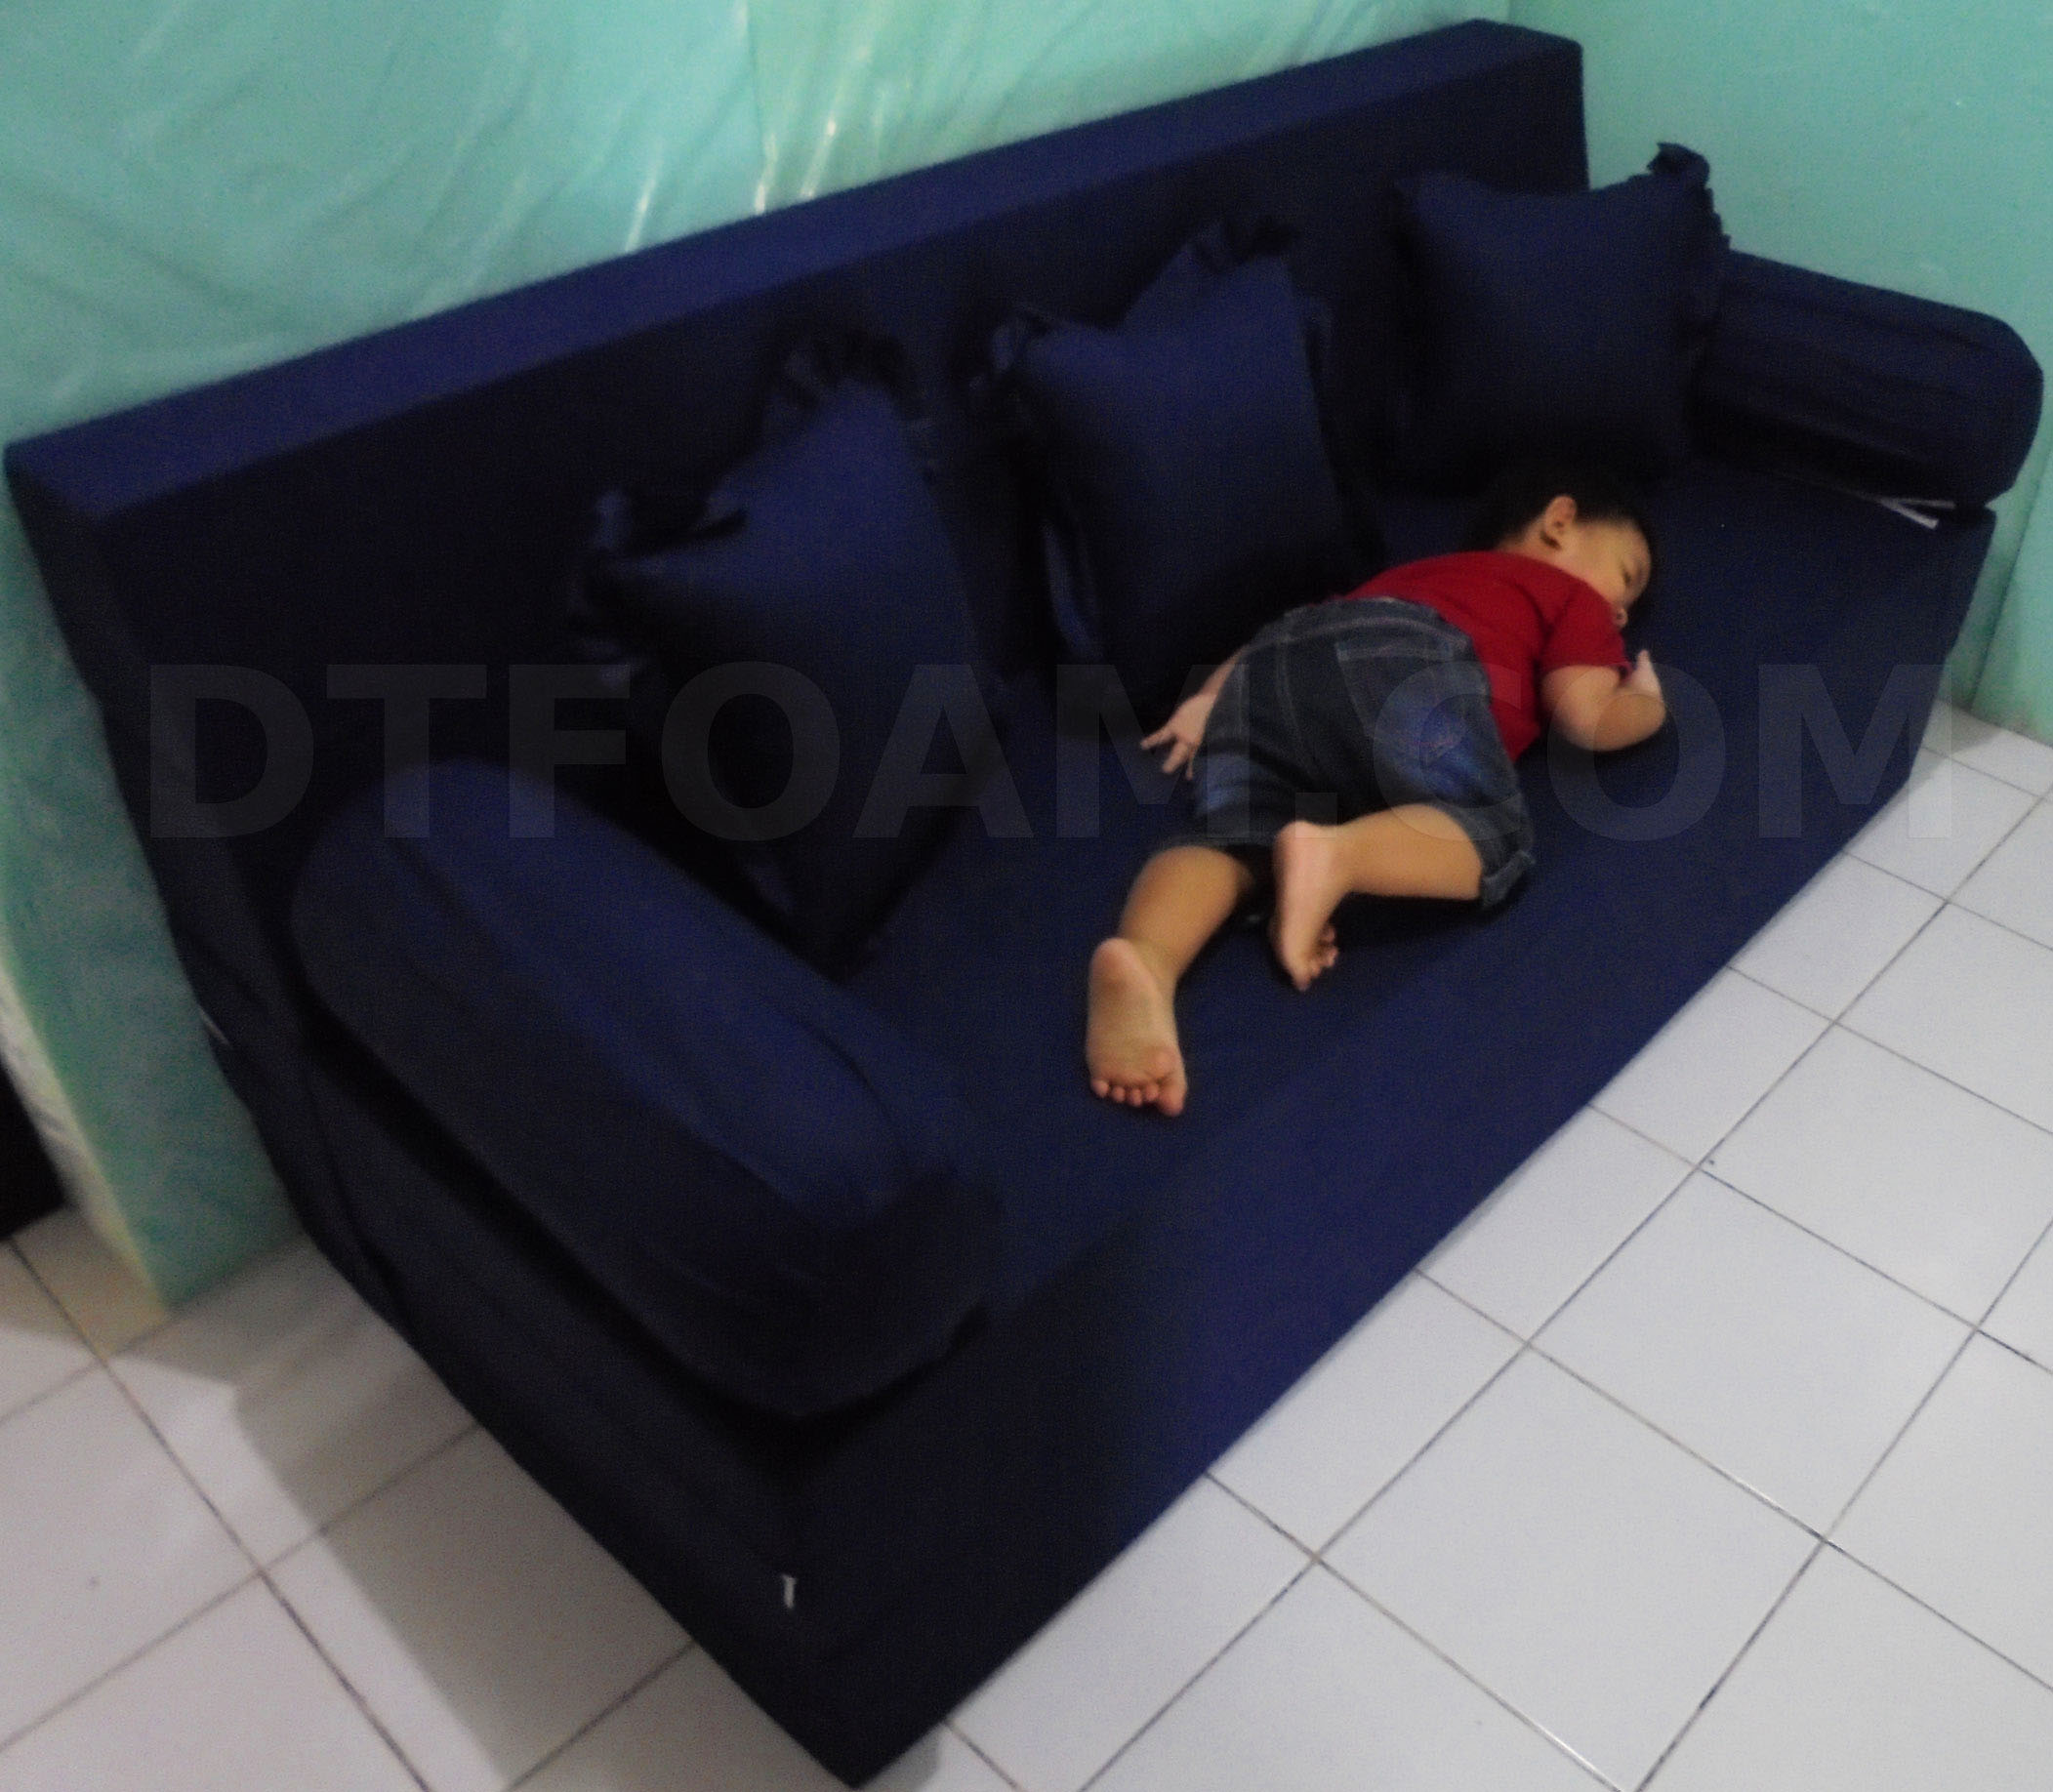 sofa bed kasur busa lipat inoac jakarta lazy boy sets dimana toko tempat beli di online dtfoam com tidur dan biru tua polos